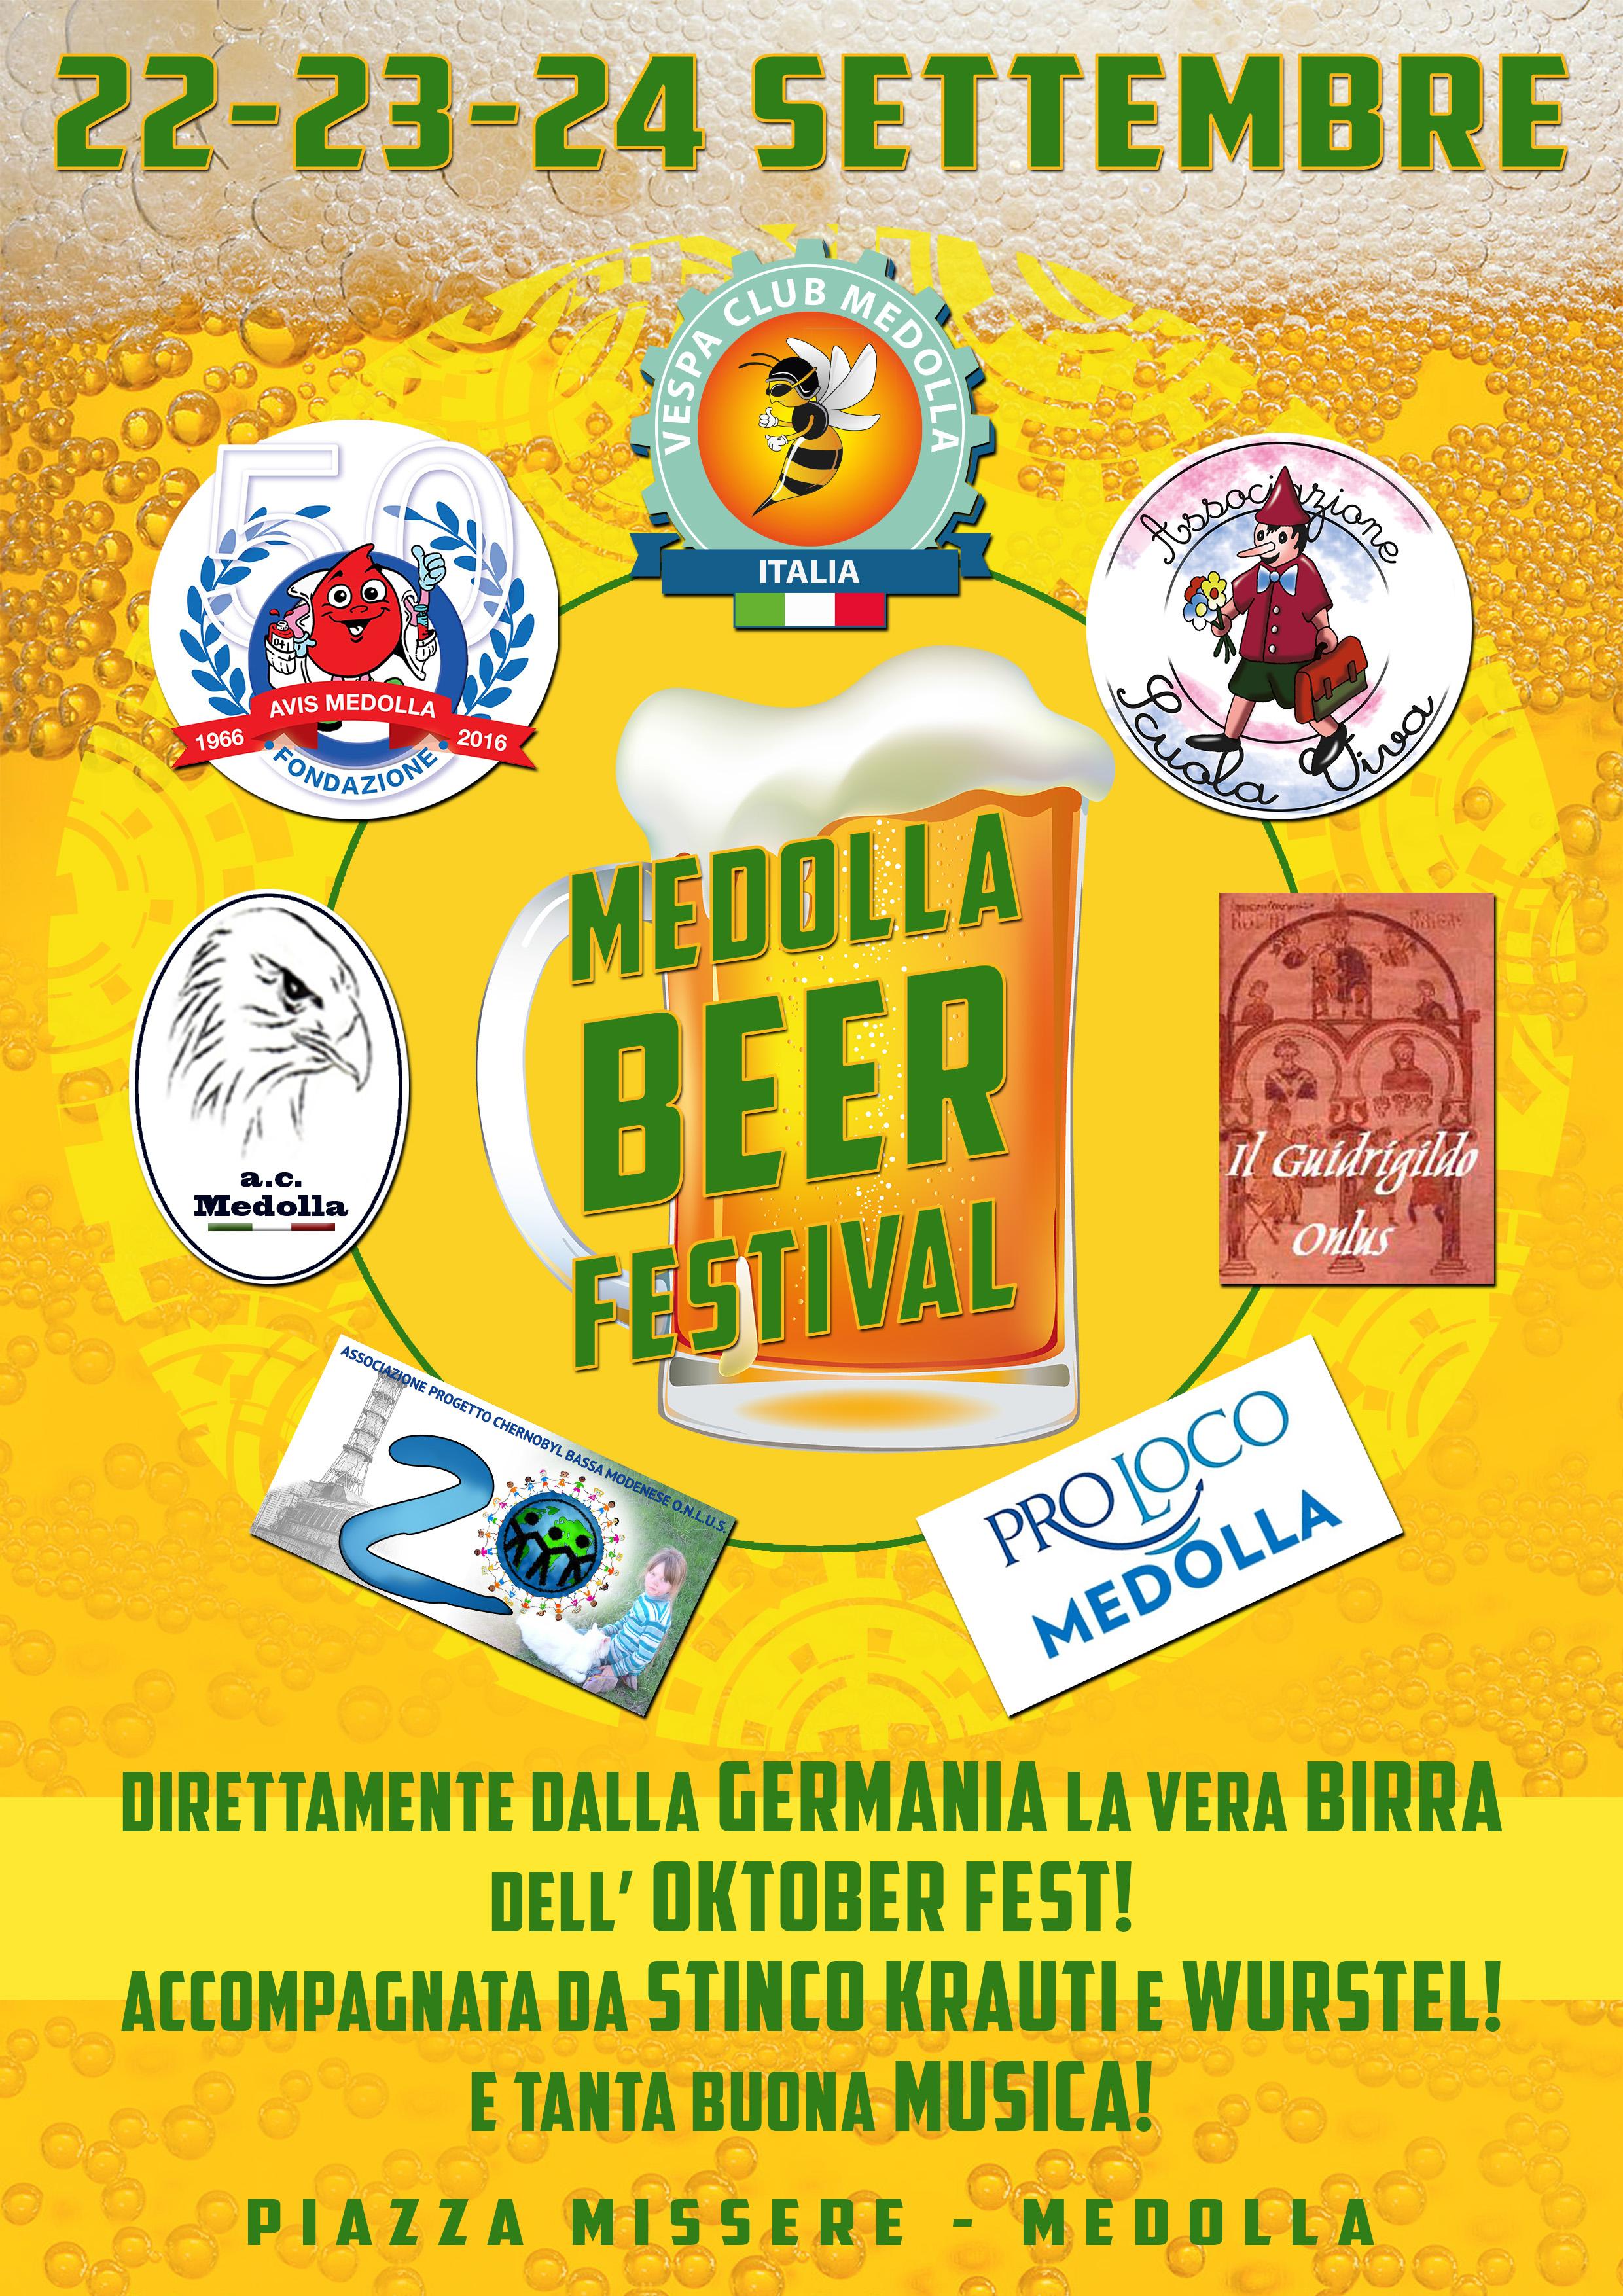 MedollaBeerFestival